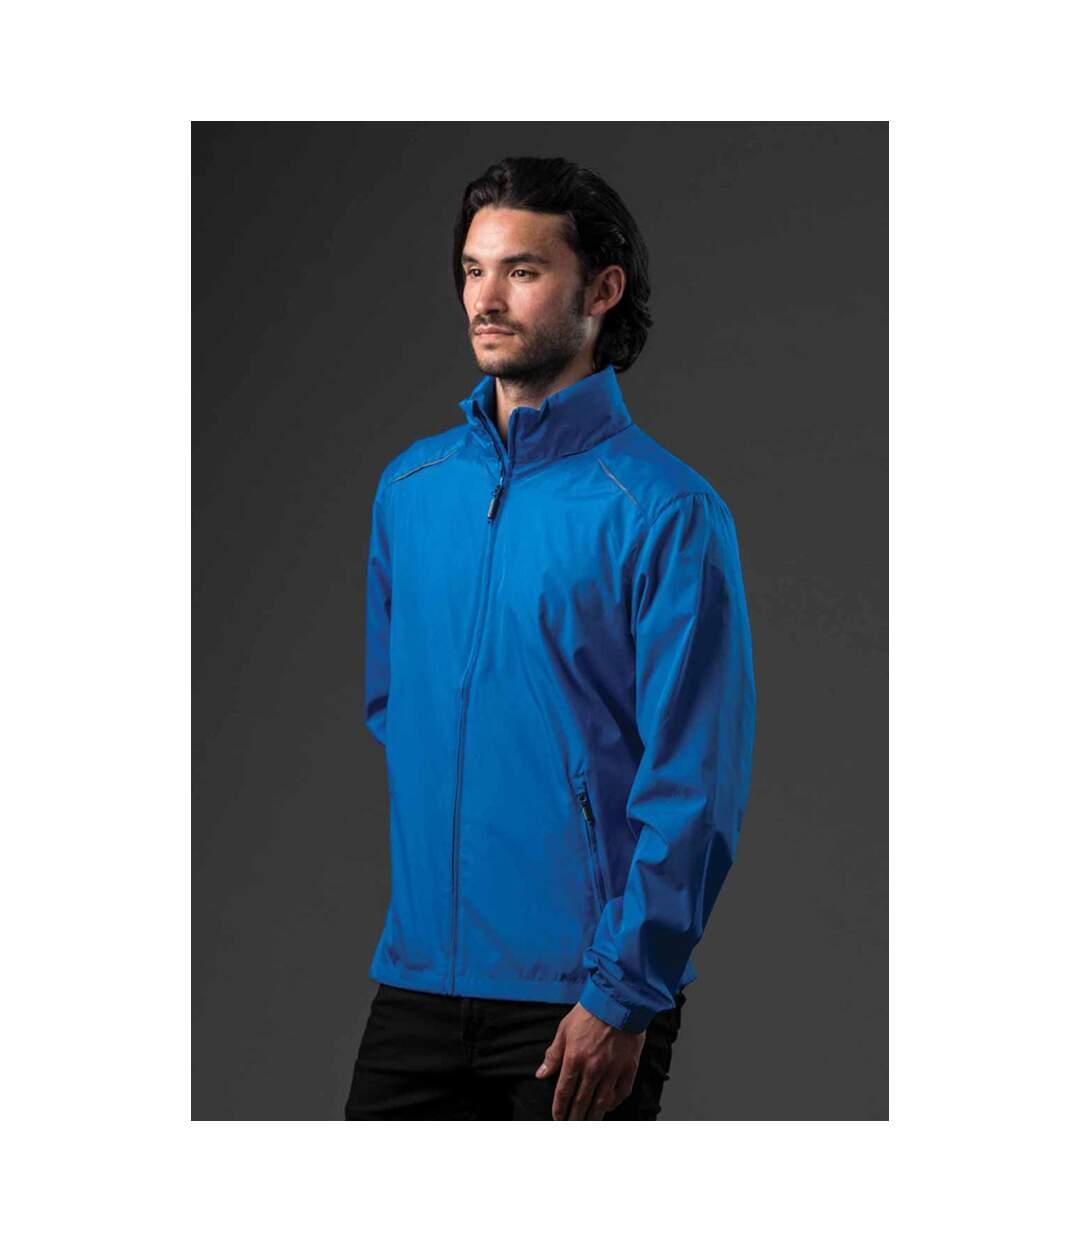 Stormtech Mens Nautilus Performance Shell Jacket (Azure Blue) - UTBC3881